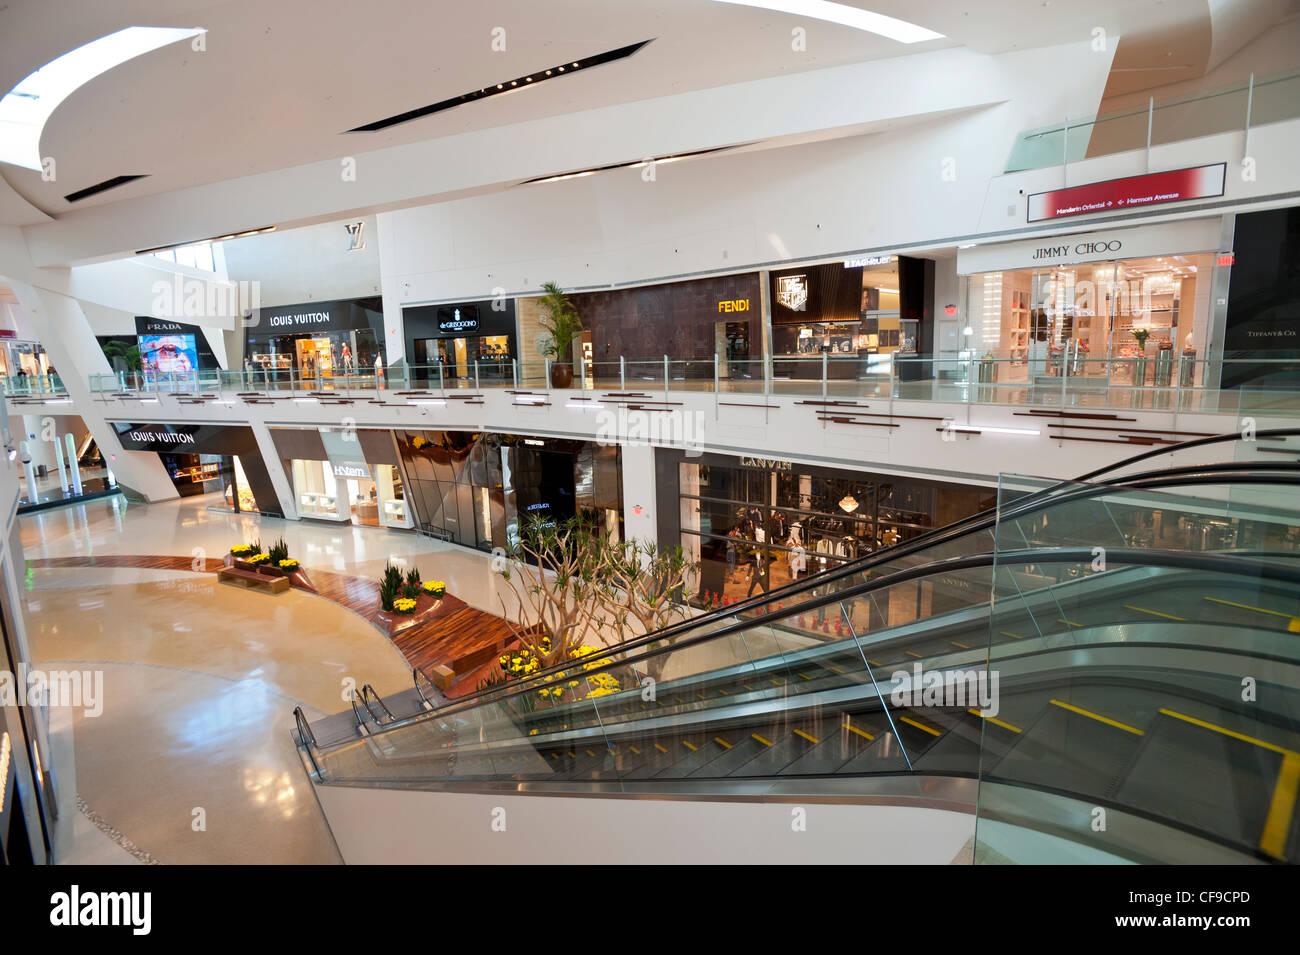 Crystals Luxury Shopping Mall at CityCenter, Paradise, Las Vegas Strip, USA Stock Photo